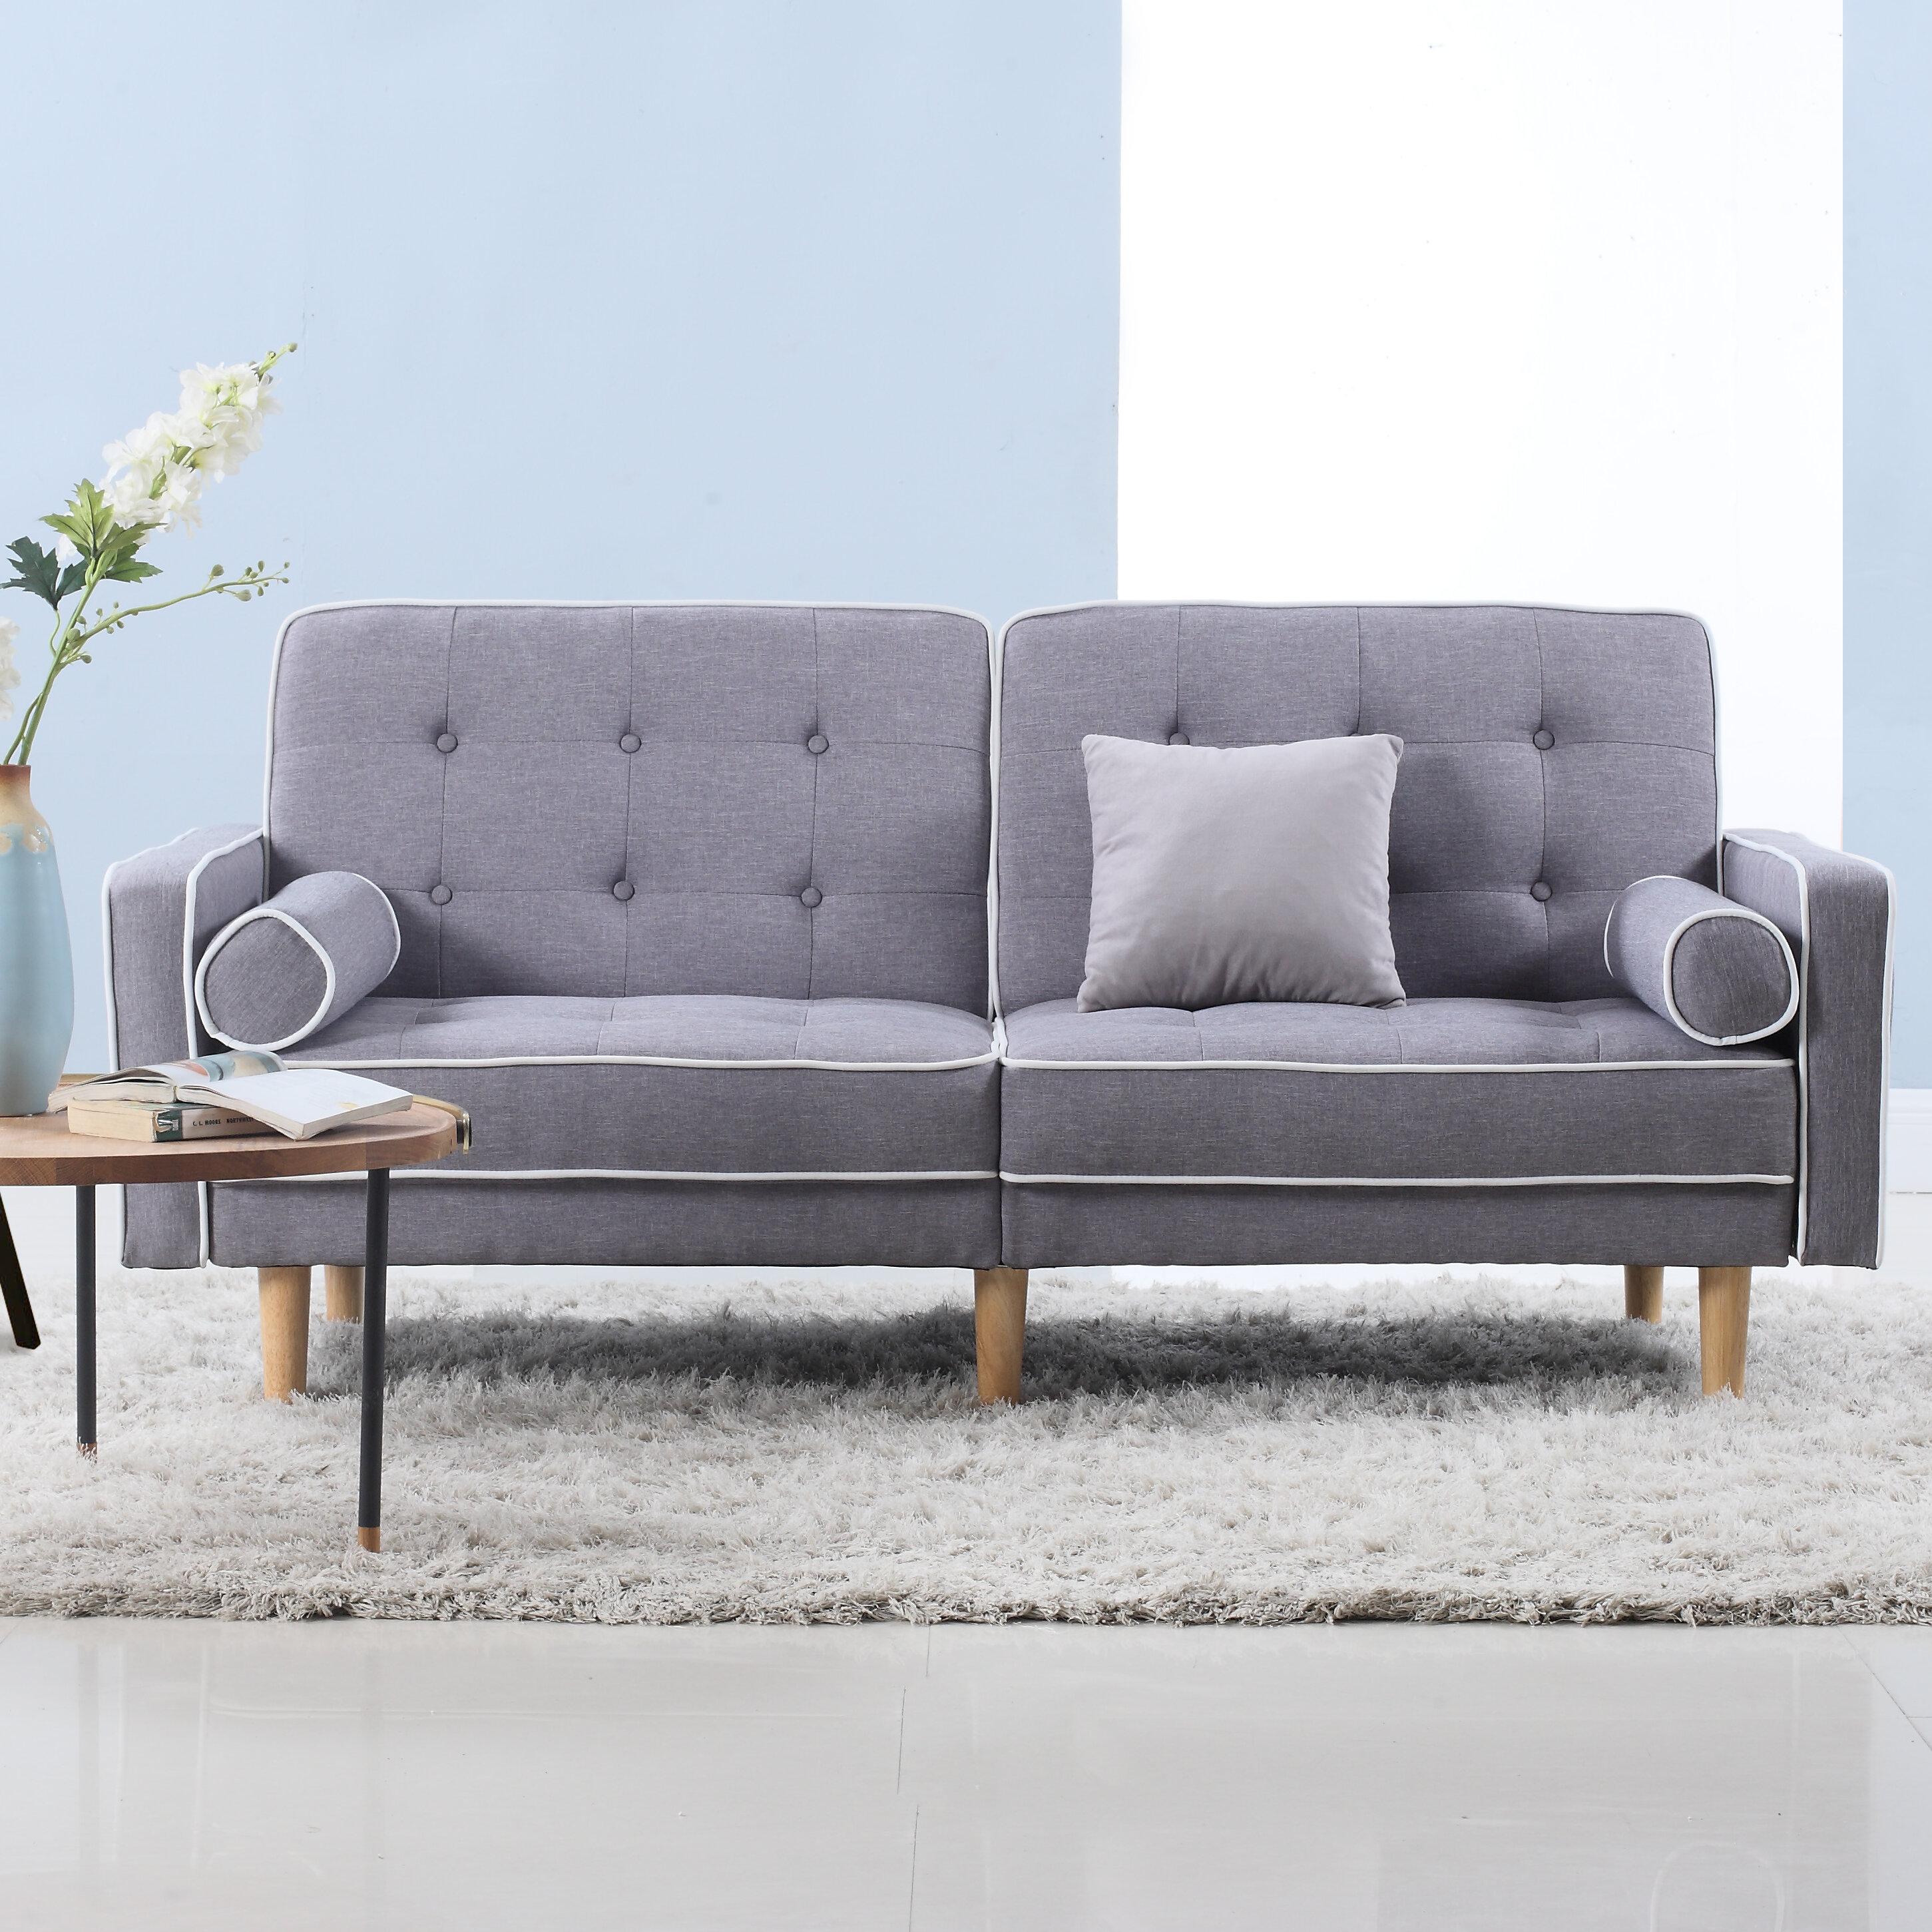 madison home usa mid century modern convertible sofa reviews wayfair